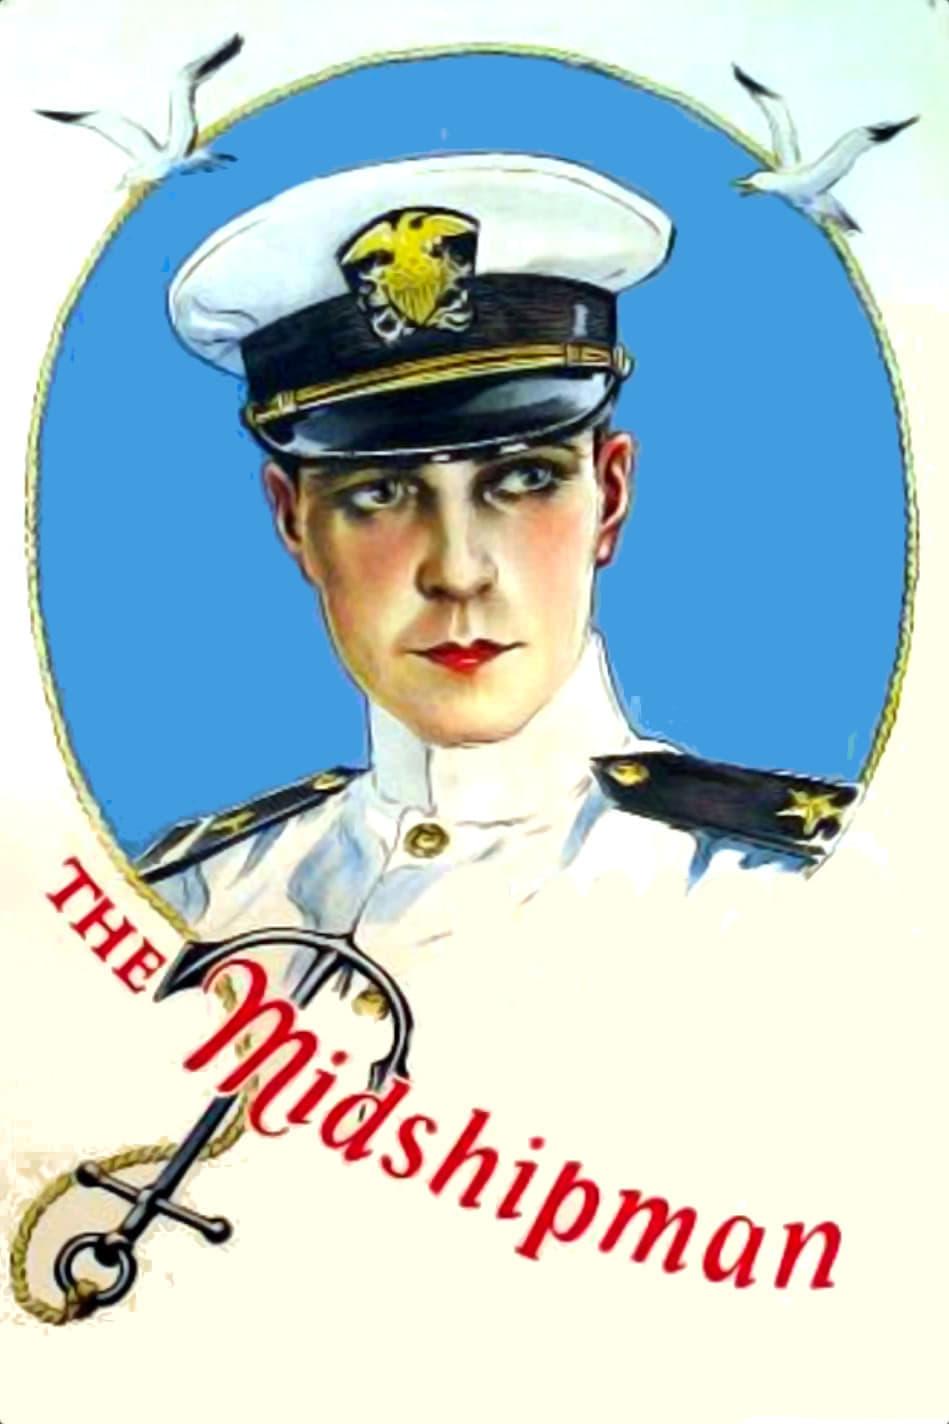 The Midshipman